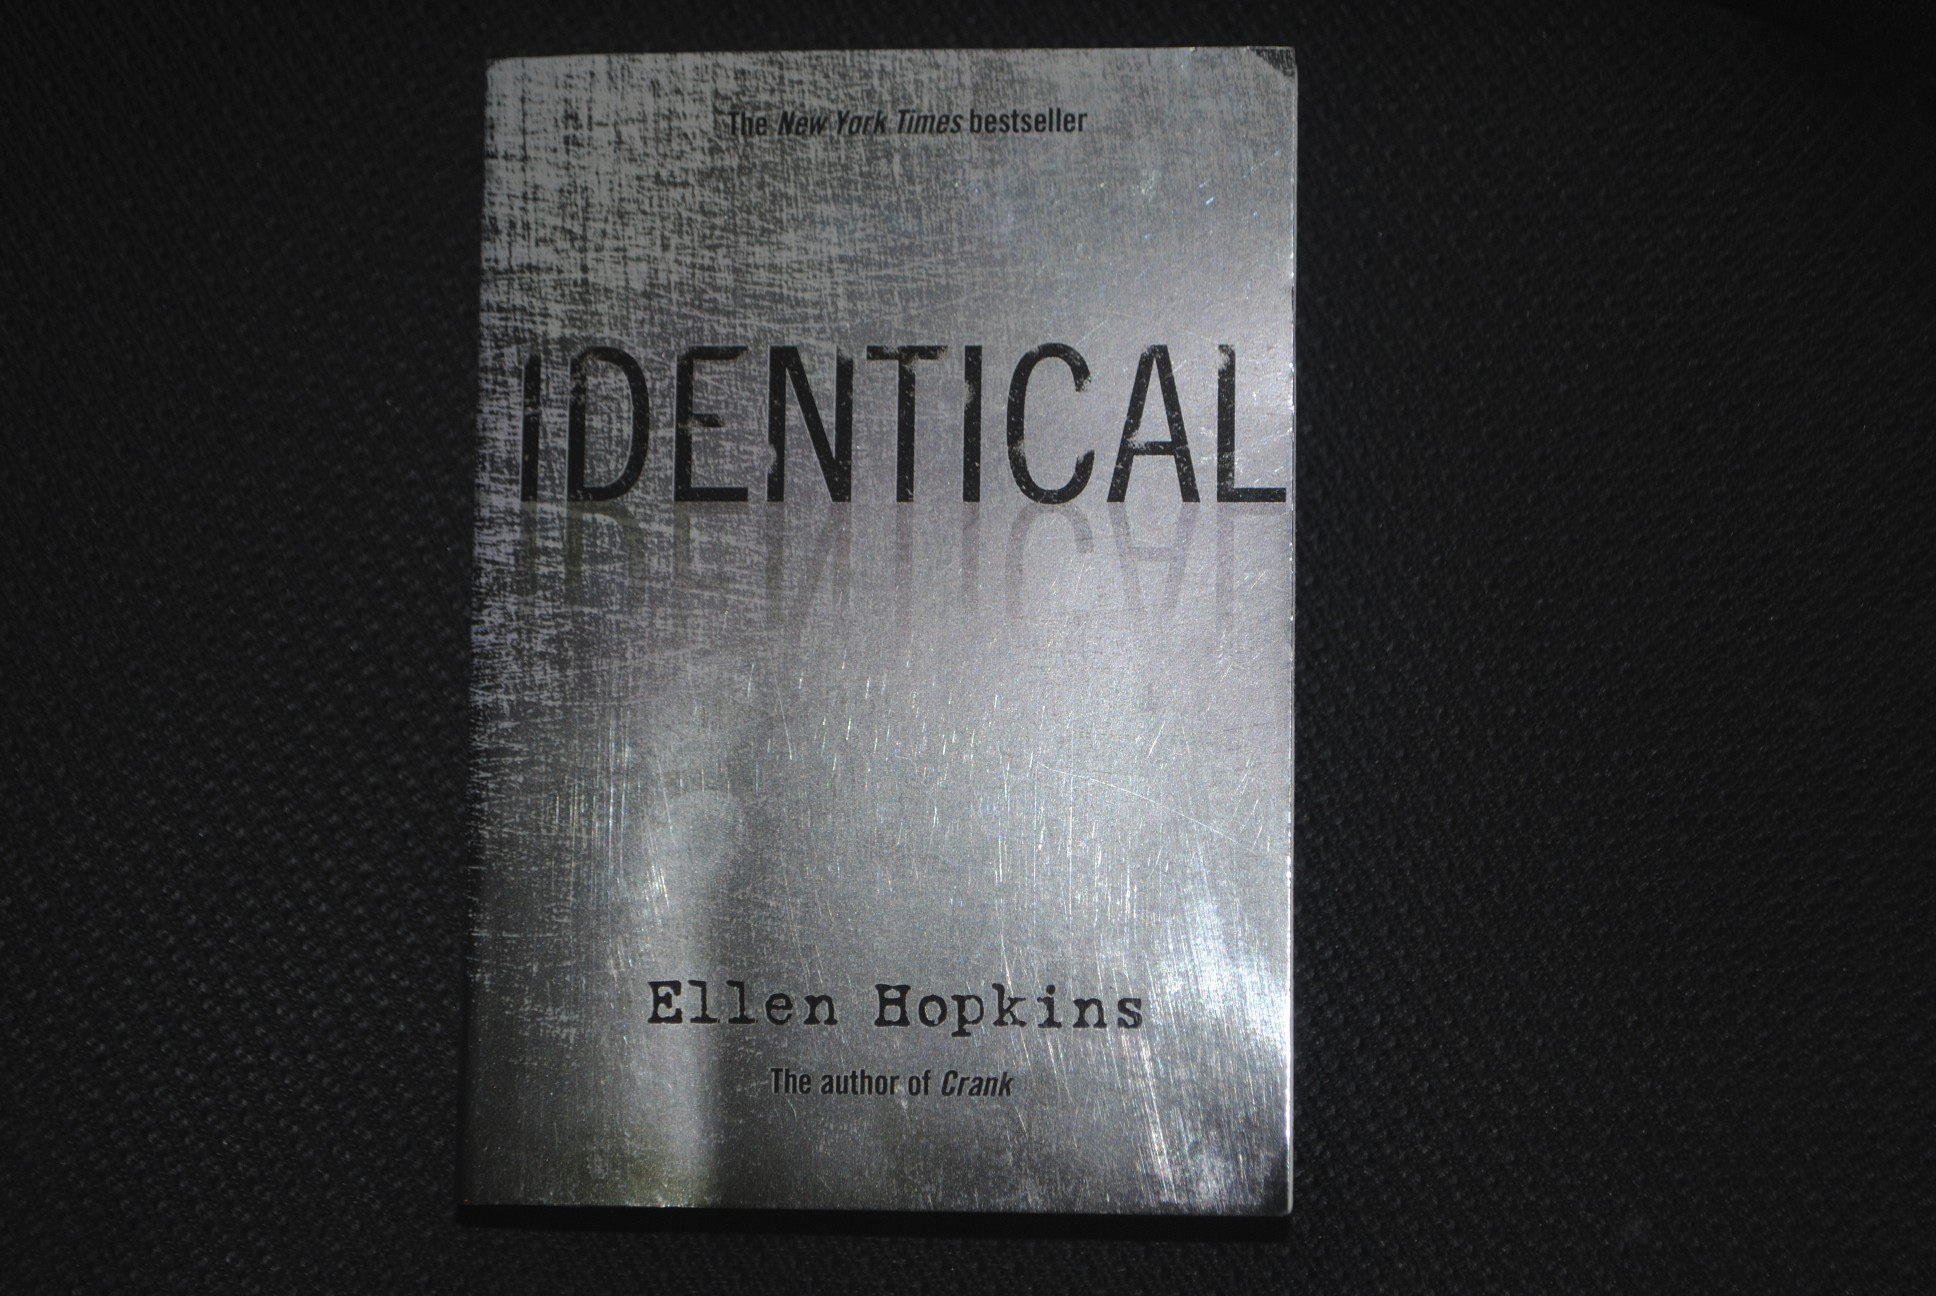 Ellen hopkins identical